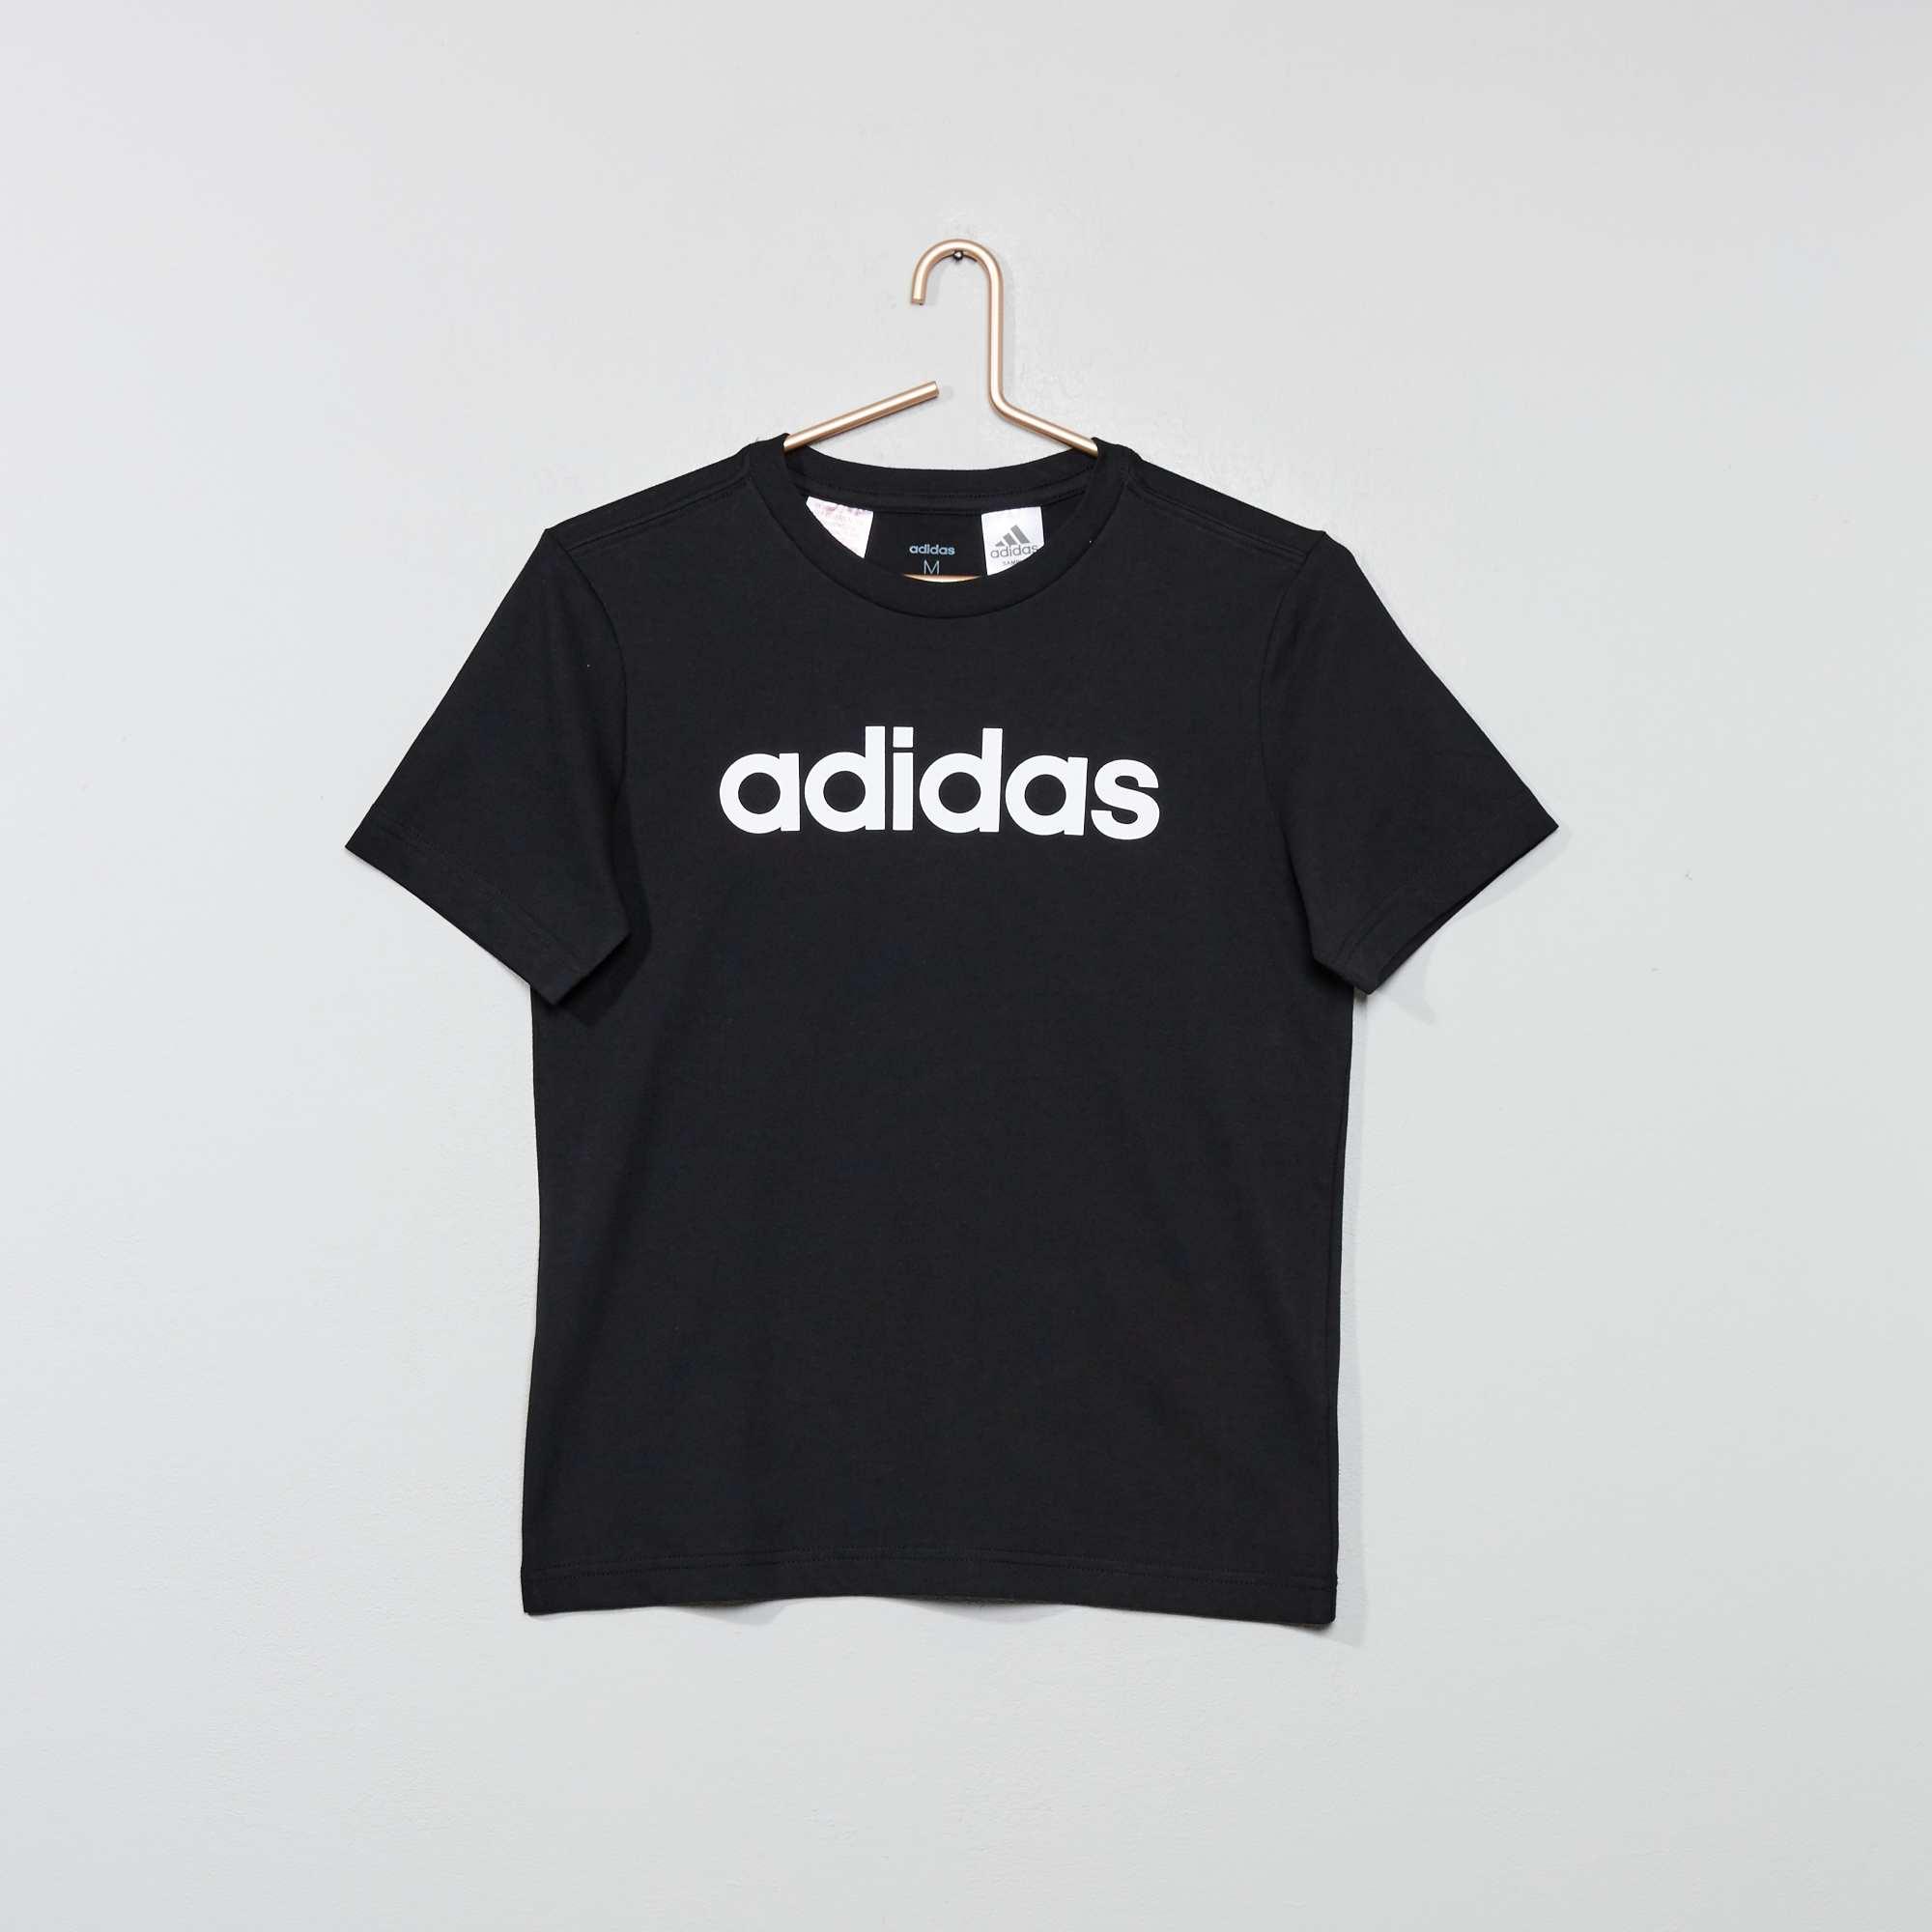 46a28594266 Camiseta 'Adidas' Joven niño - NEGRO - Kiabi - 15,00€